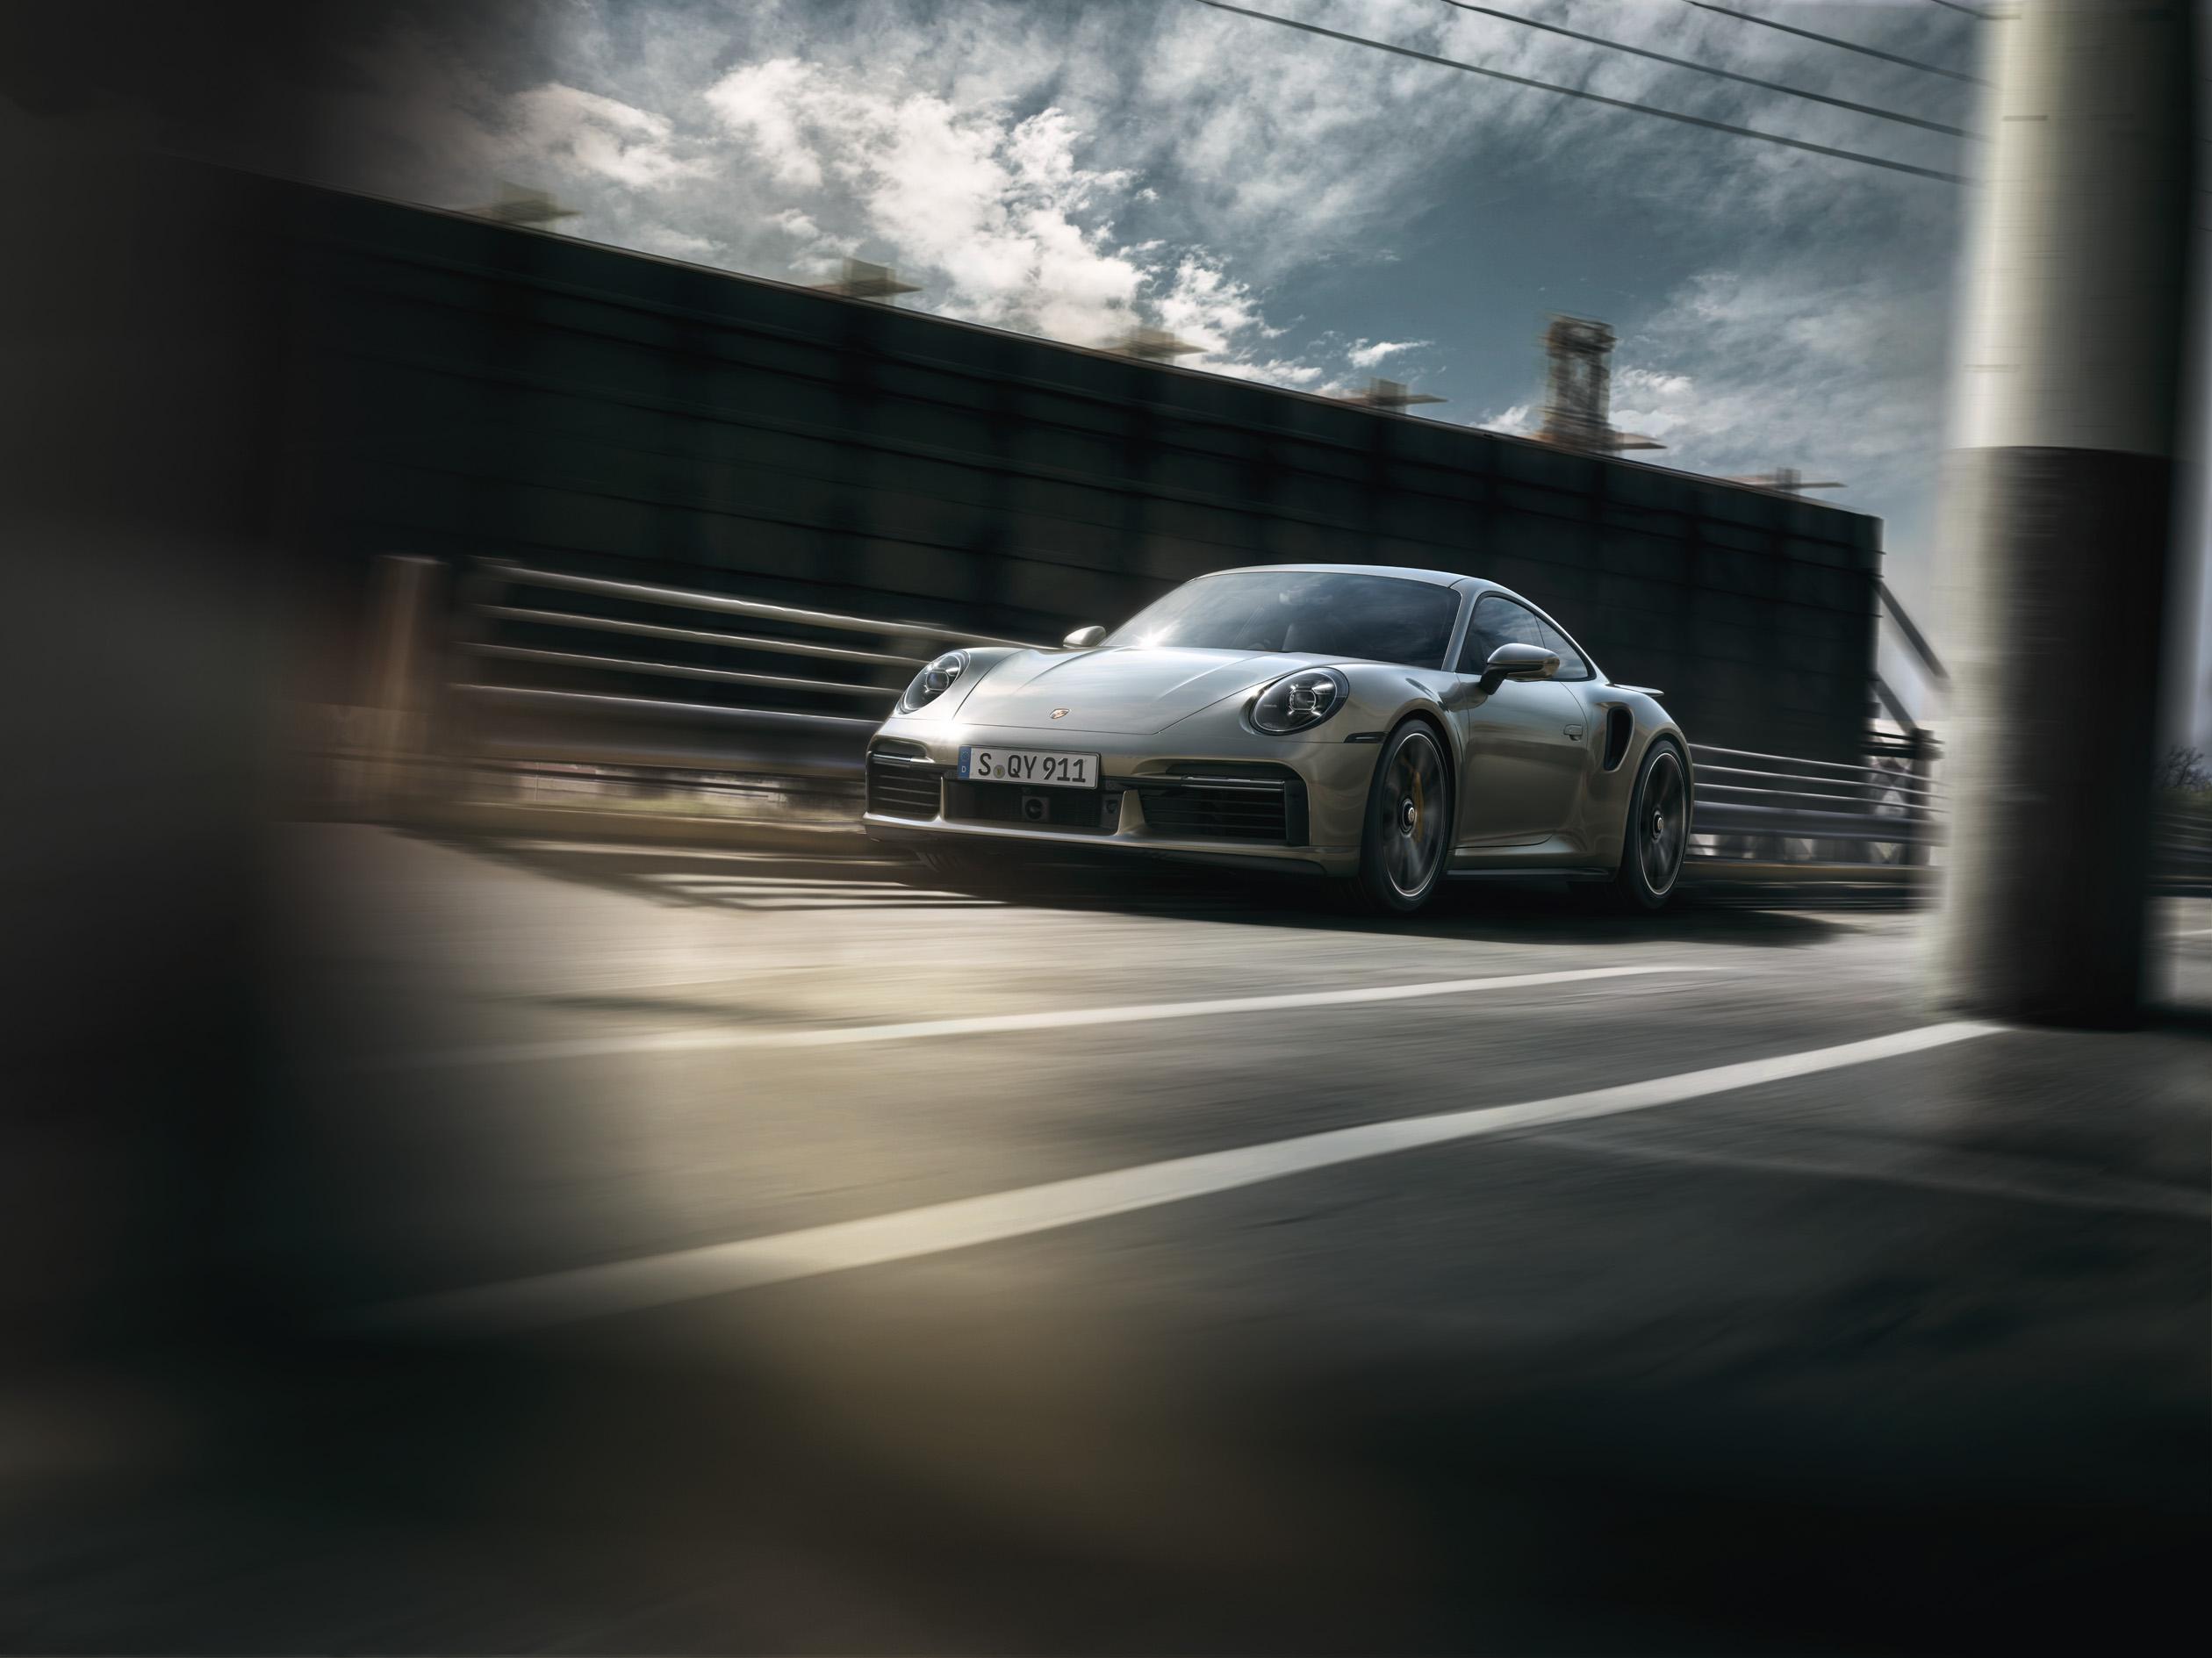 Porsche 911 Turbo S [2]